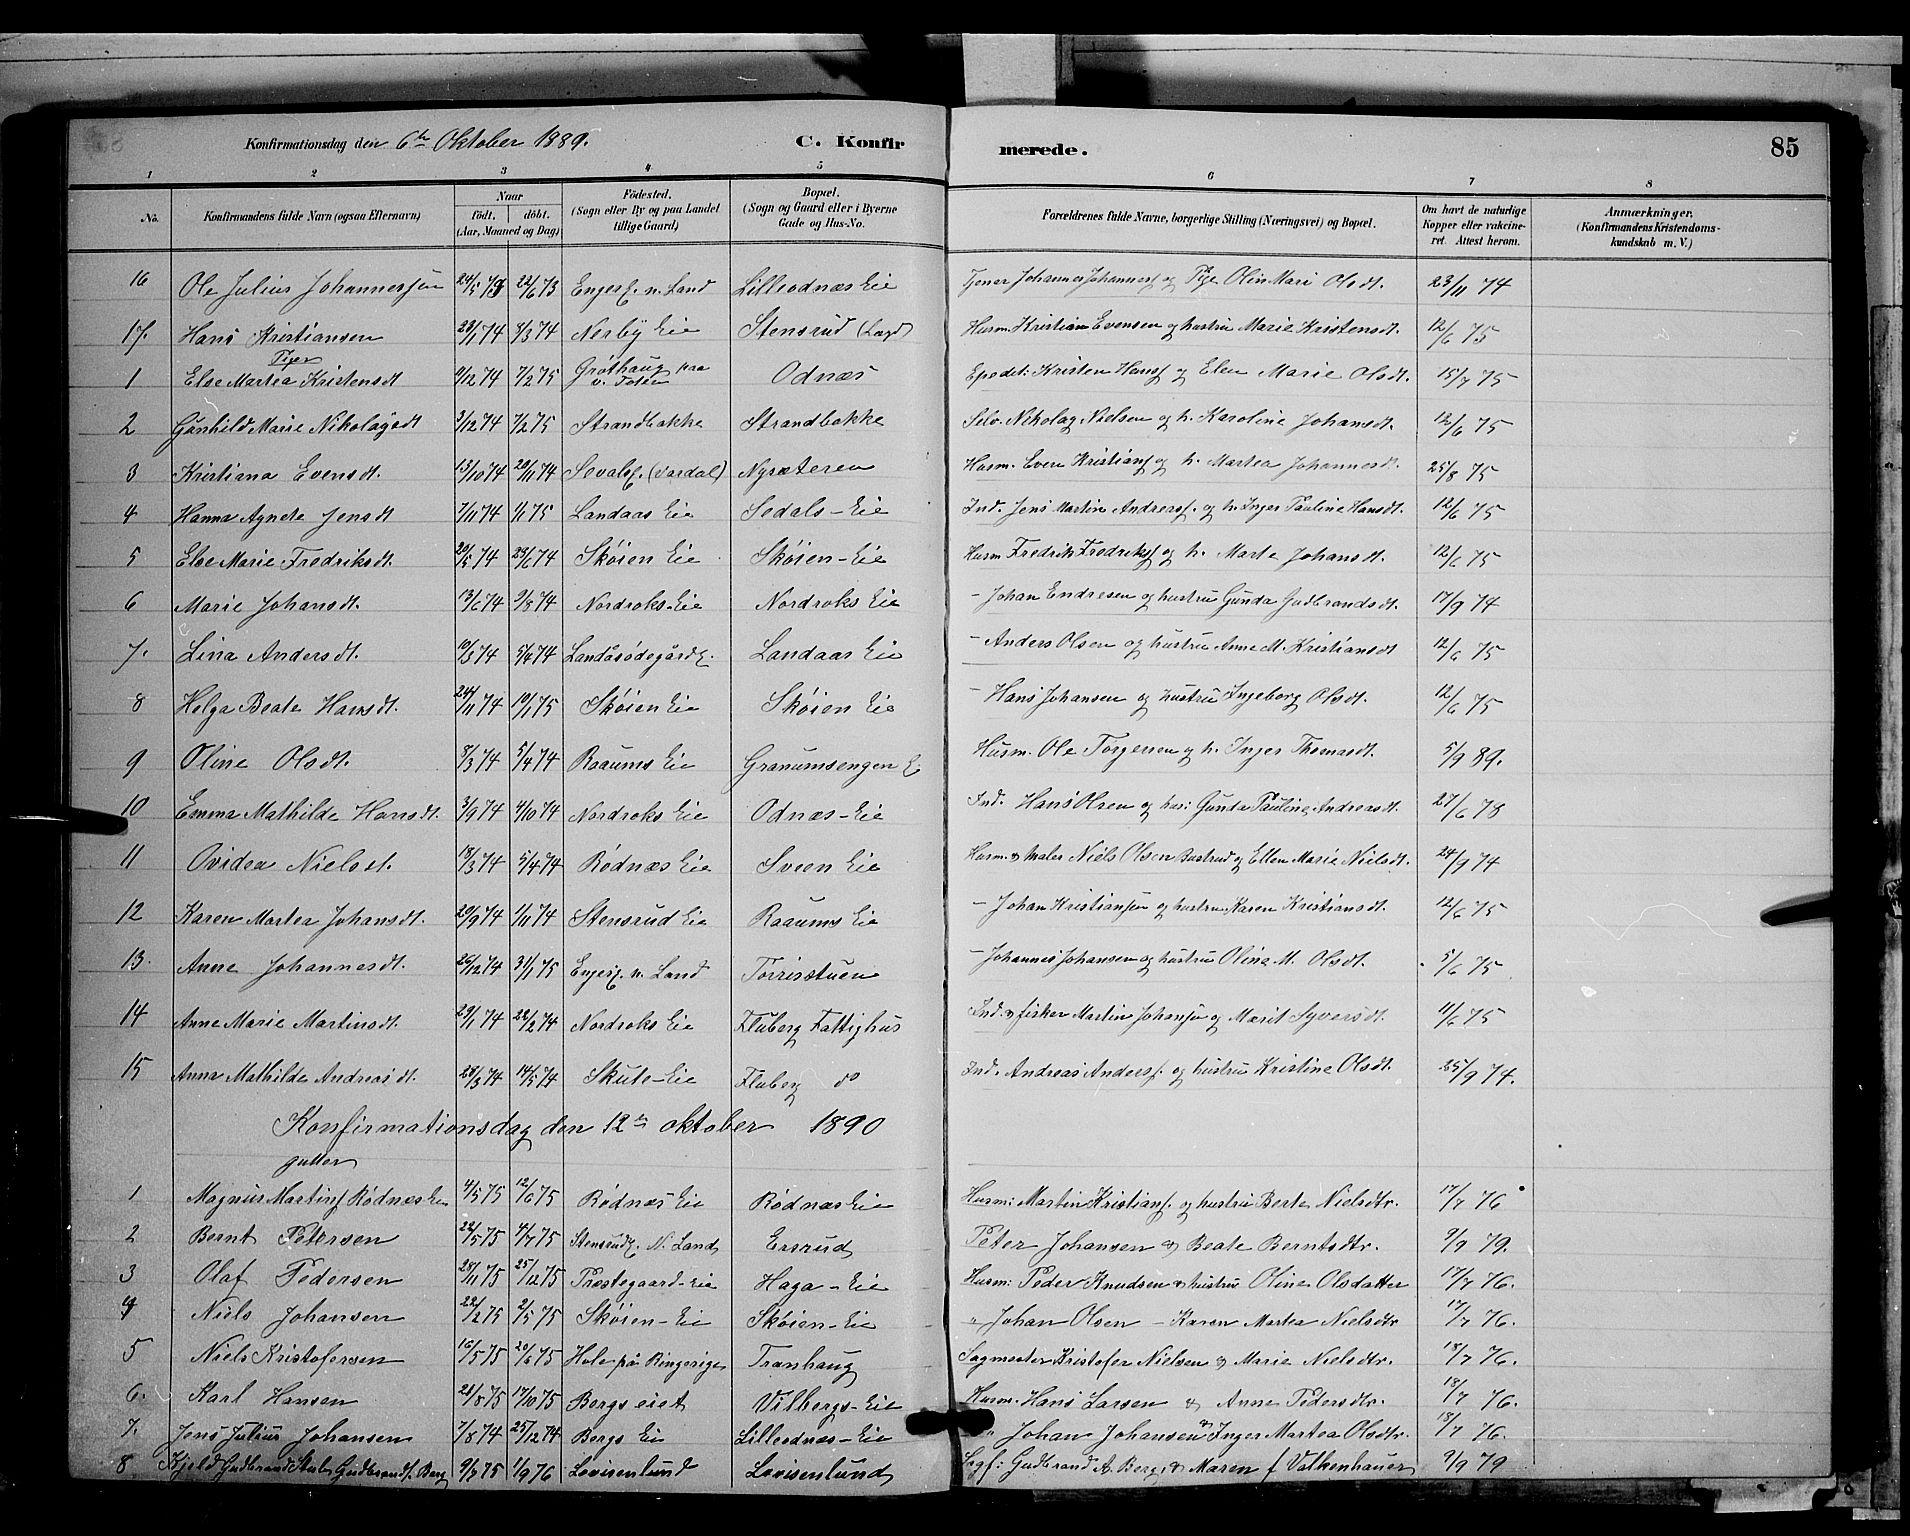 SAH, Søndre Land prestekontor, L/L0003: Klokkerbok nr. 3, 1884-1902, s. 85